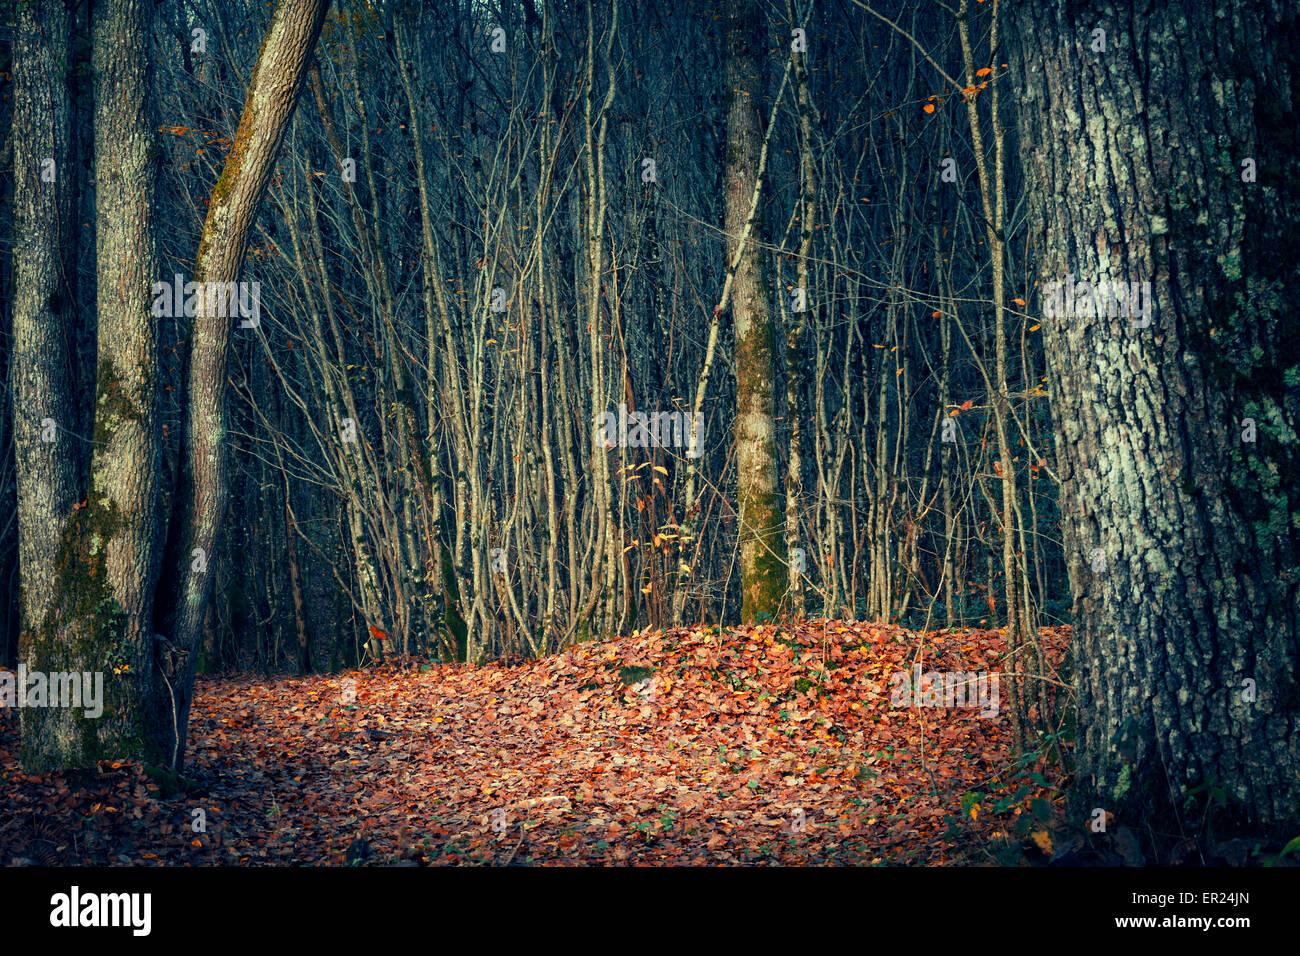 Bois forêt arbre woodland Photo Stock